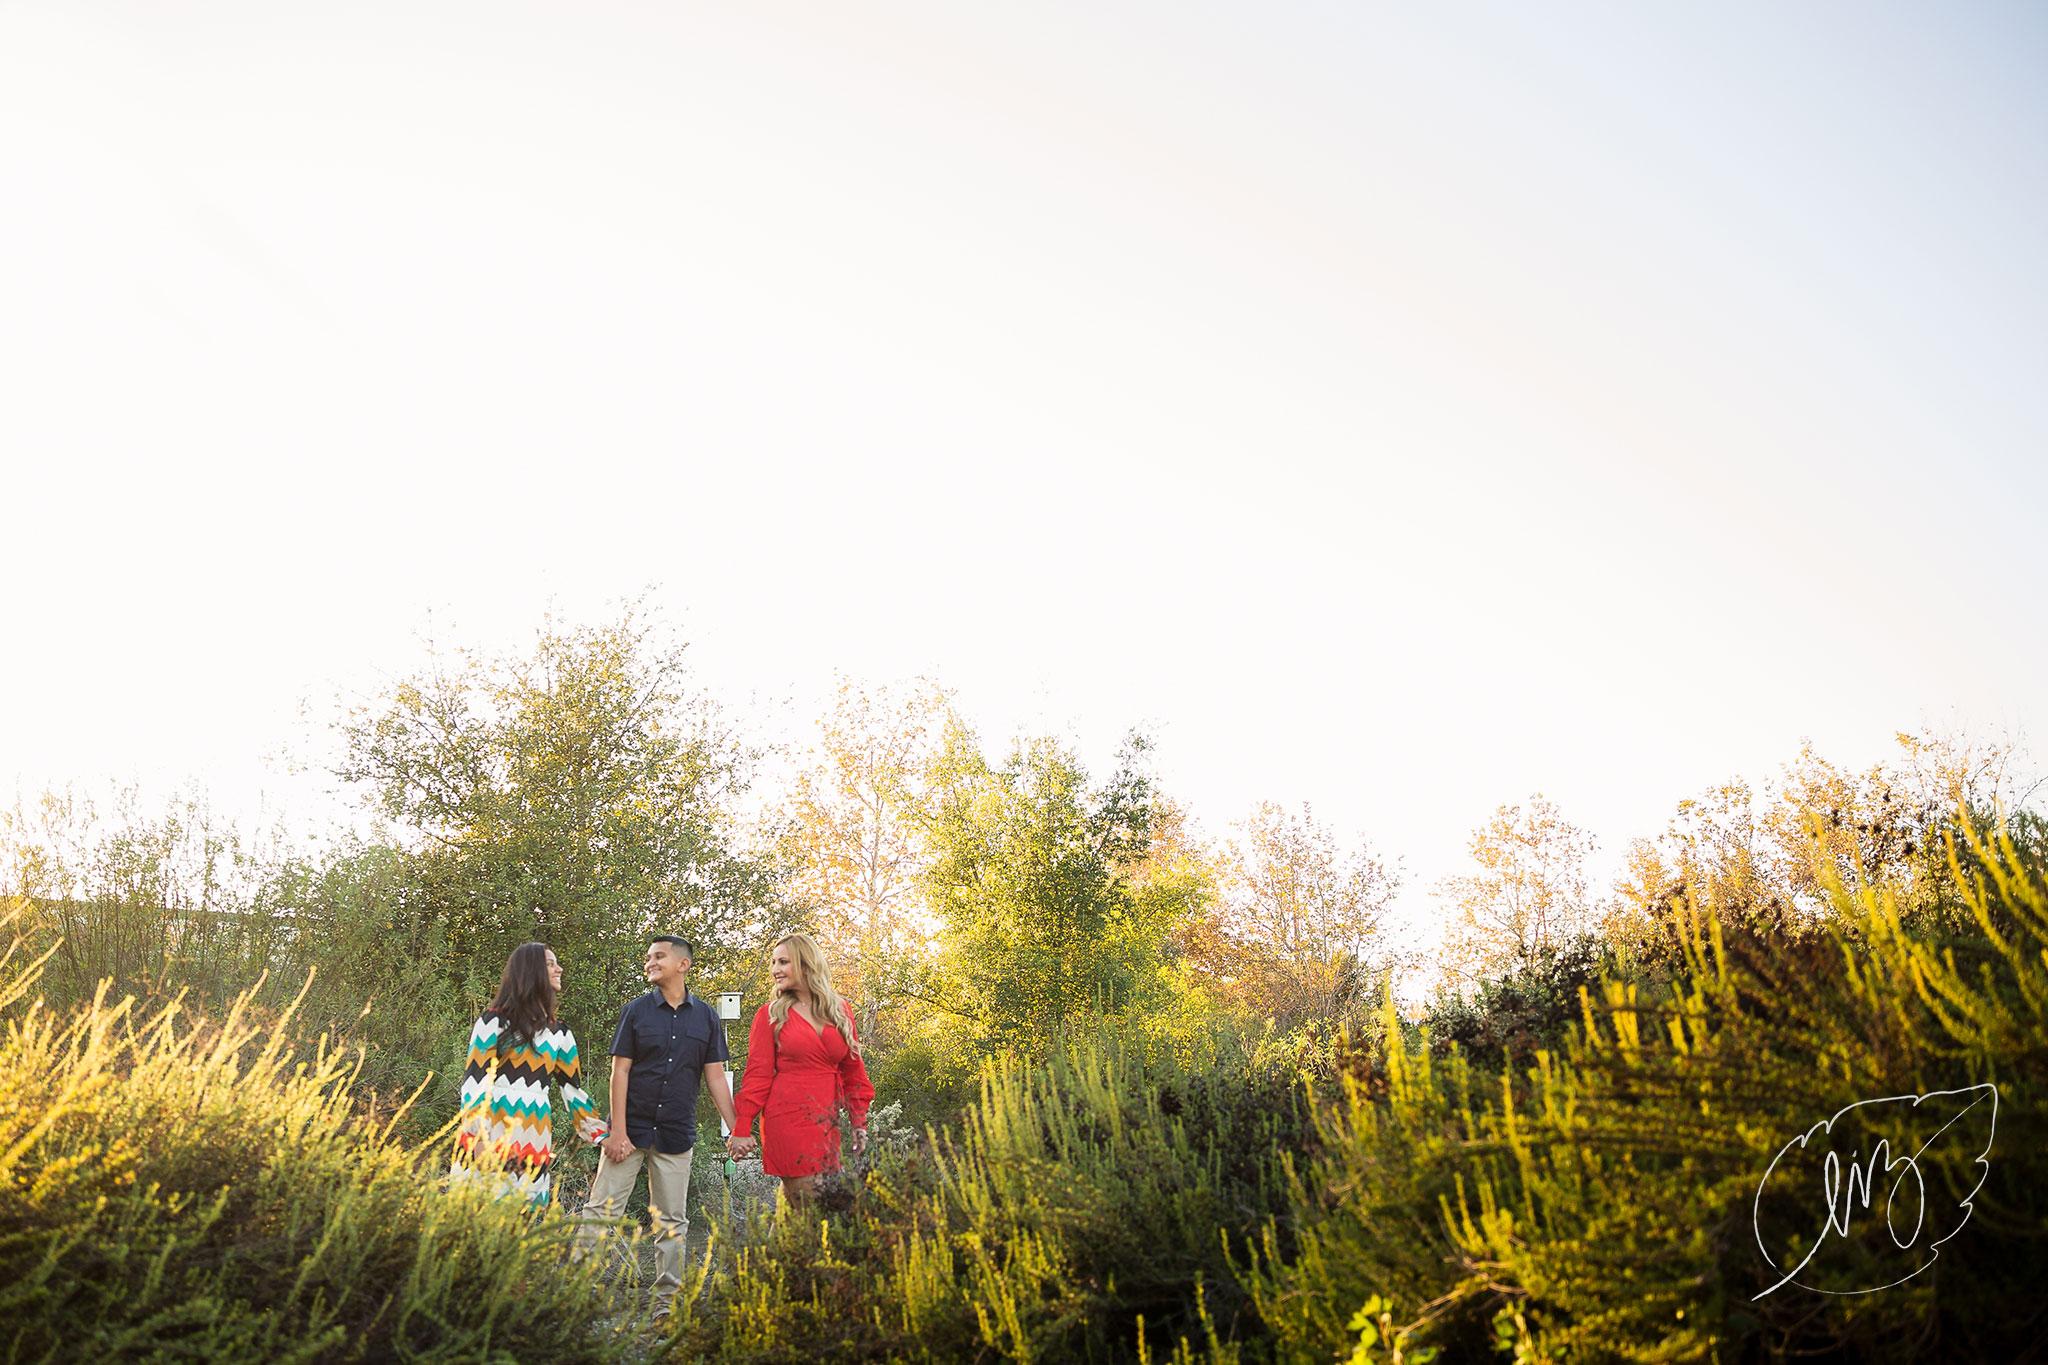 California_Inland_Empire_Family_Photographer_14.jpg